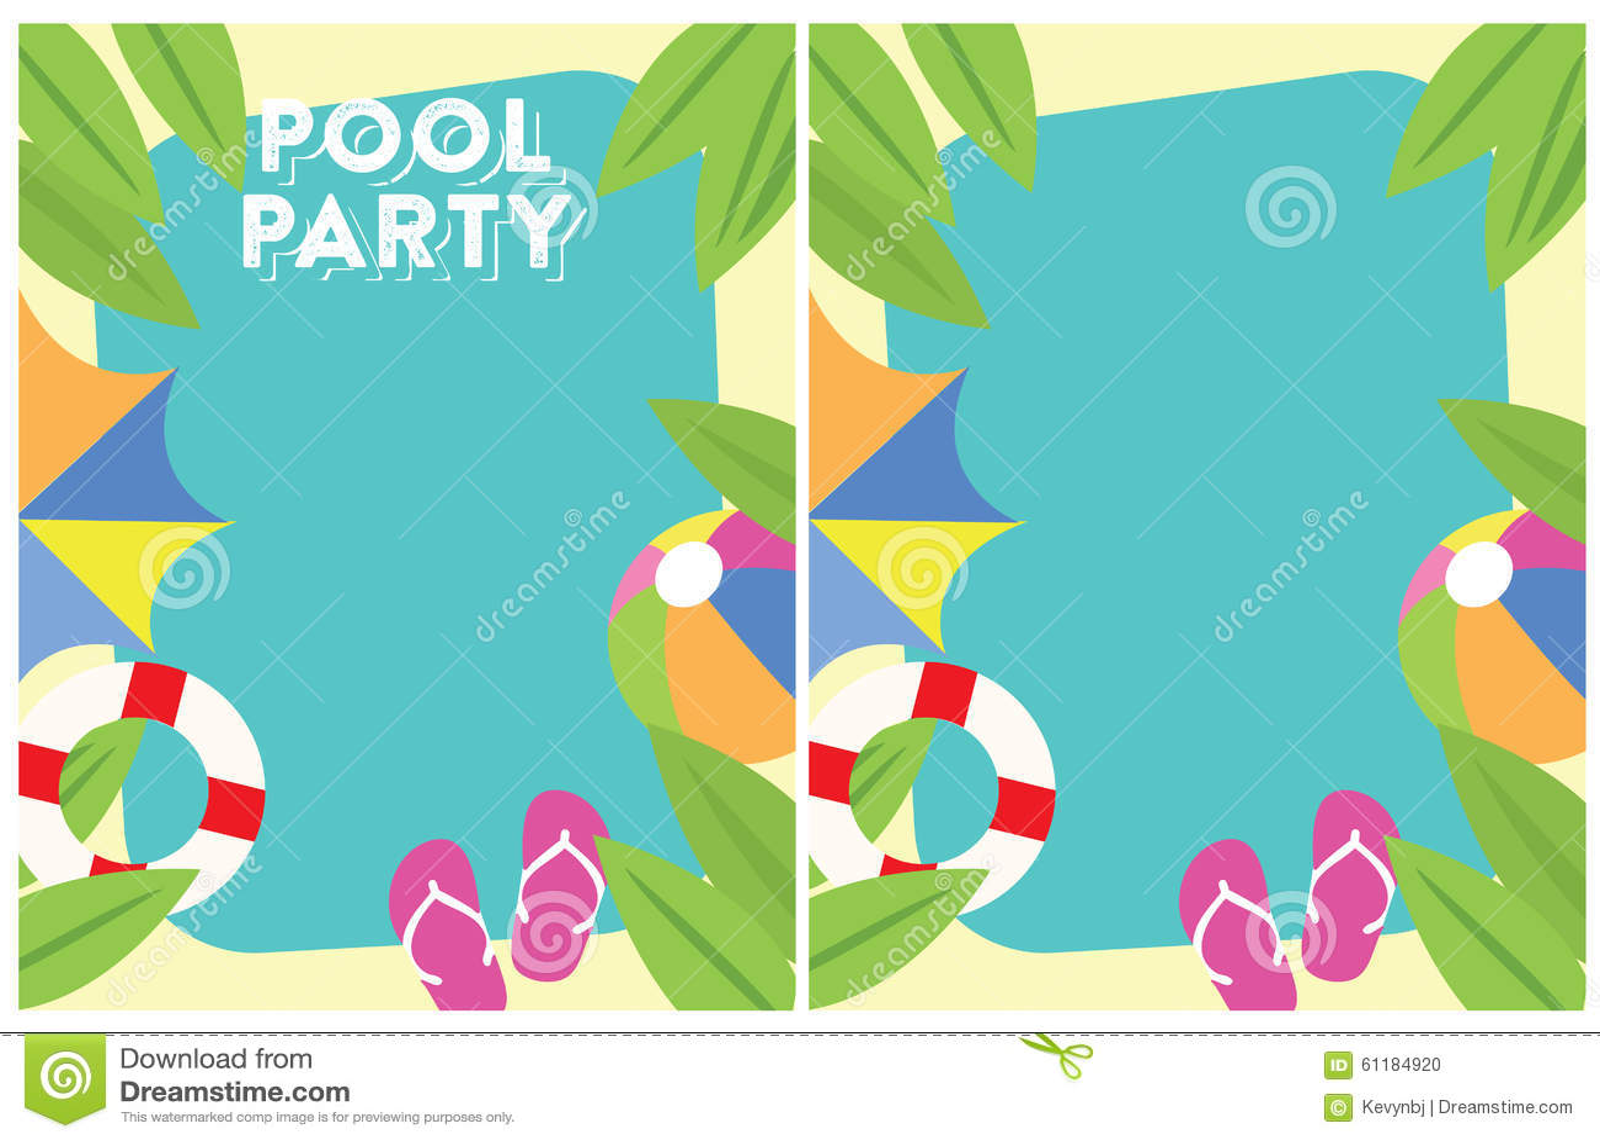 Pool Stock Illustrations – 27,954 Pool Stock Illustrations ...